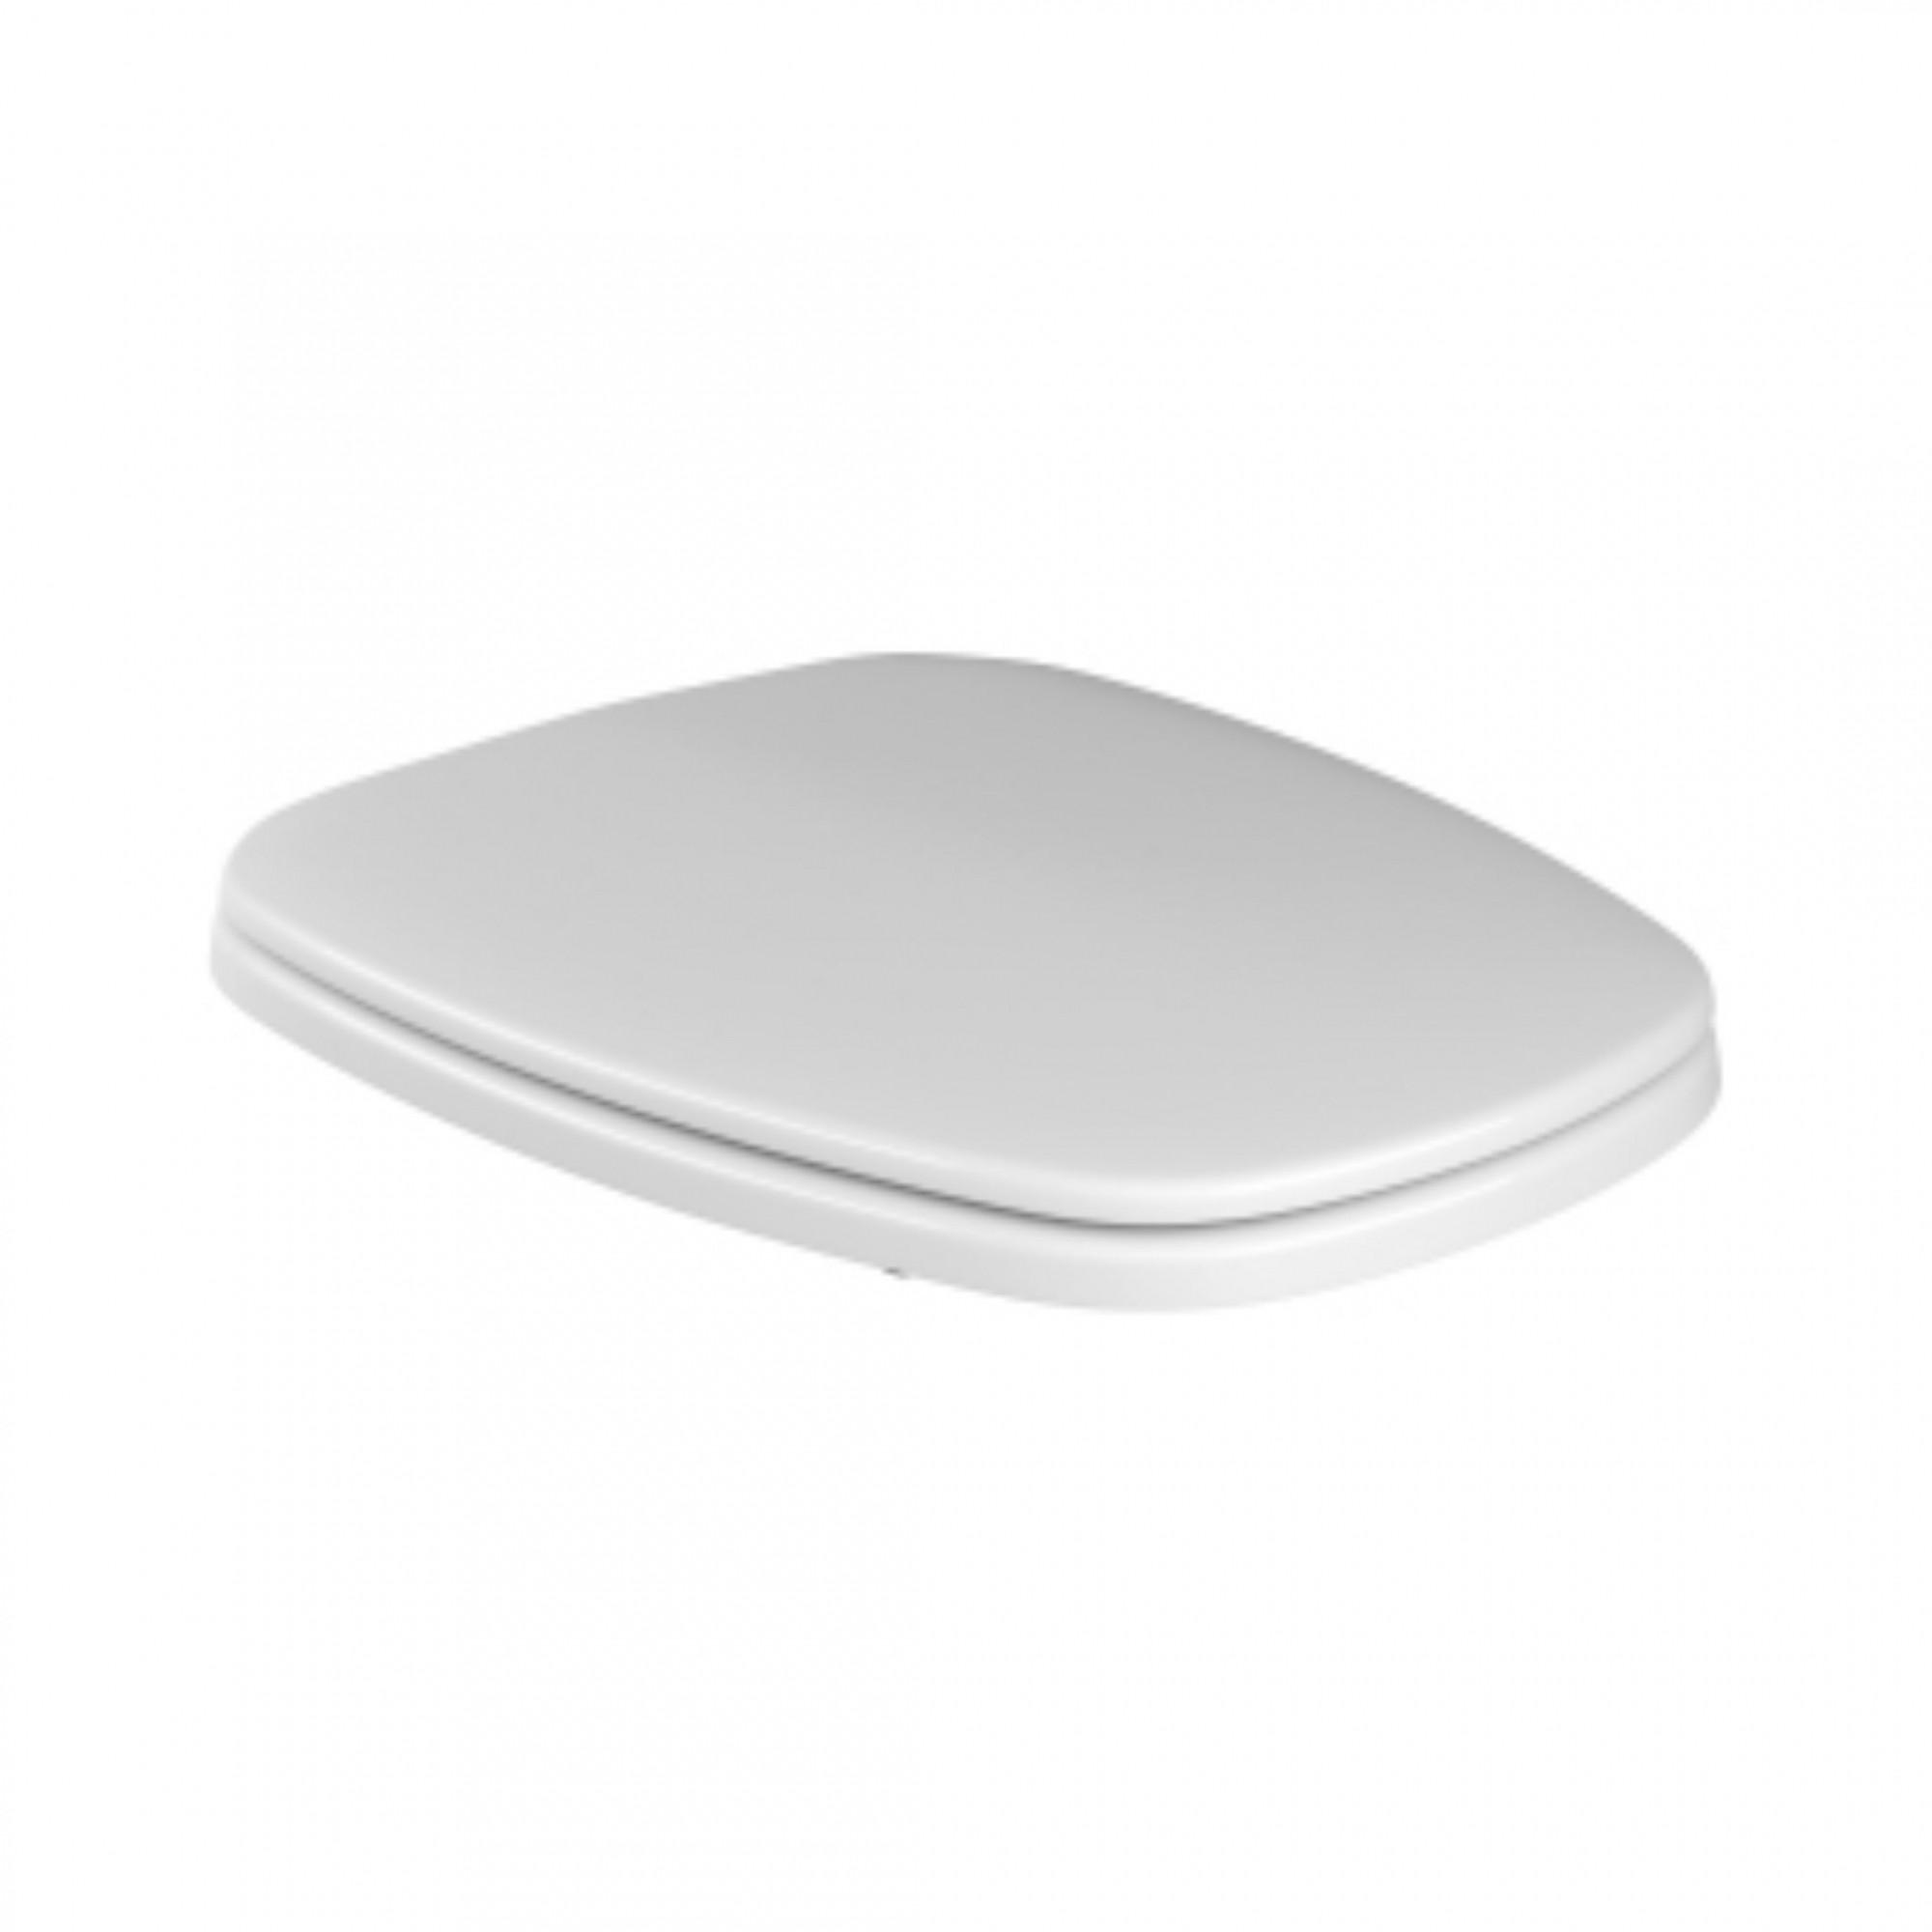 Assento Sanitário Plástico Para Bacia Monte Carlo AP.80.17 Branco Deca